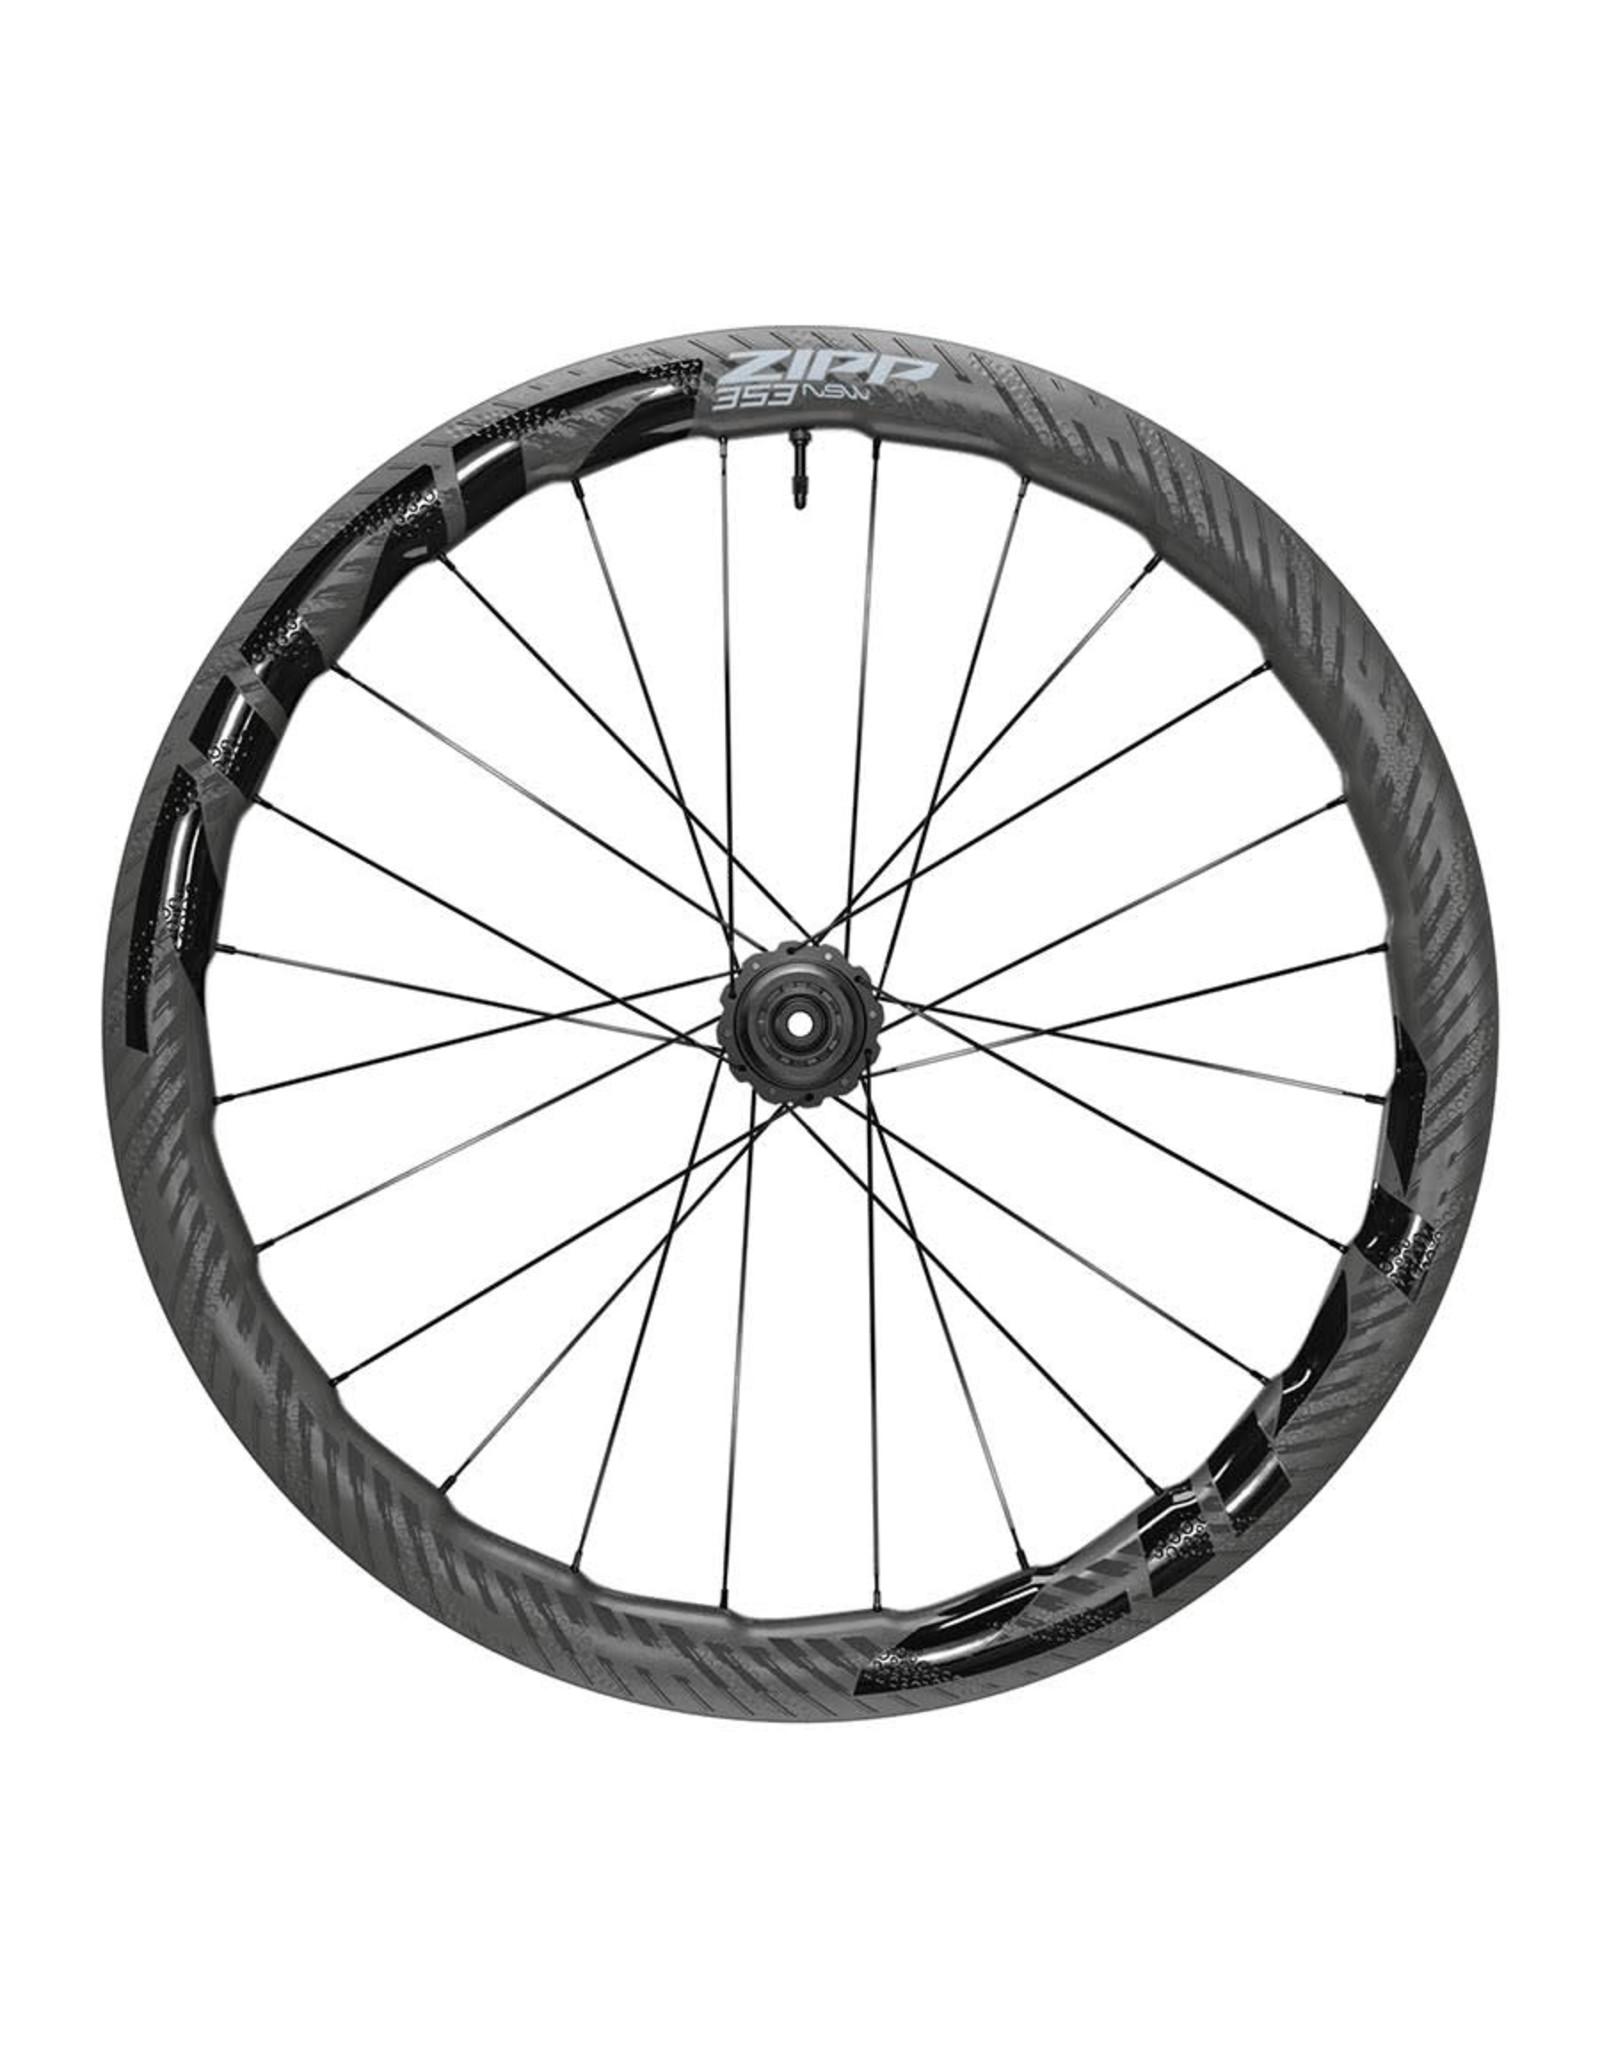 Zipp Zipp 353 NSW Tubeless Disc A1 Wheelset 12x100/12x142 DCL shimano 11